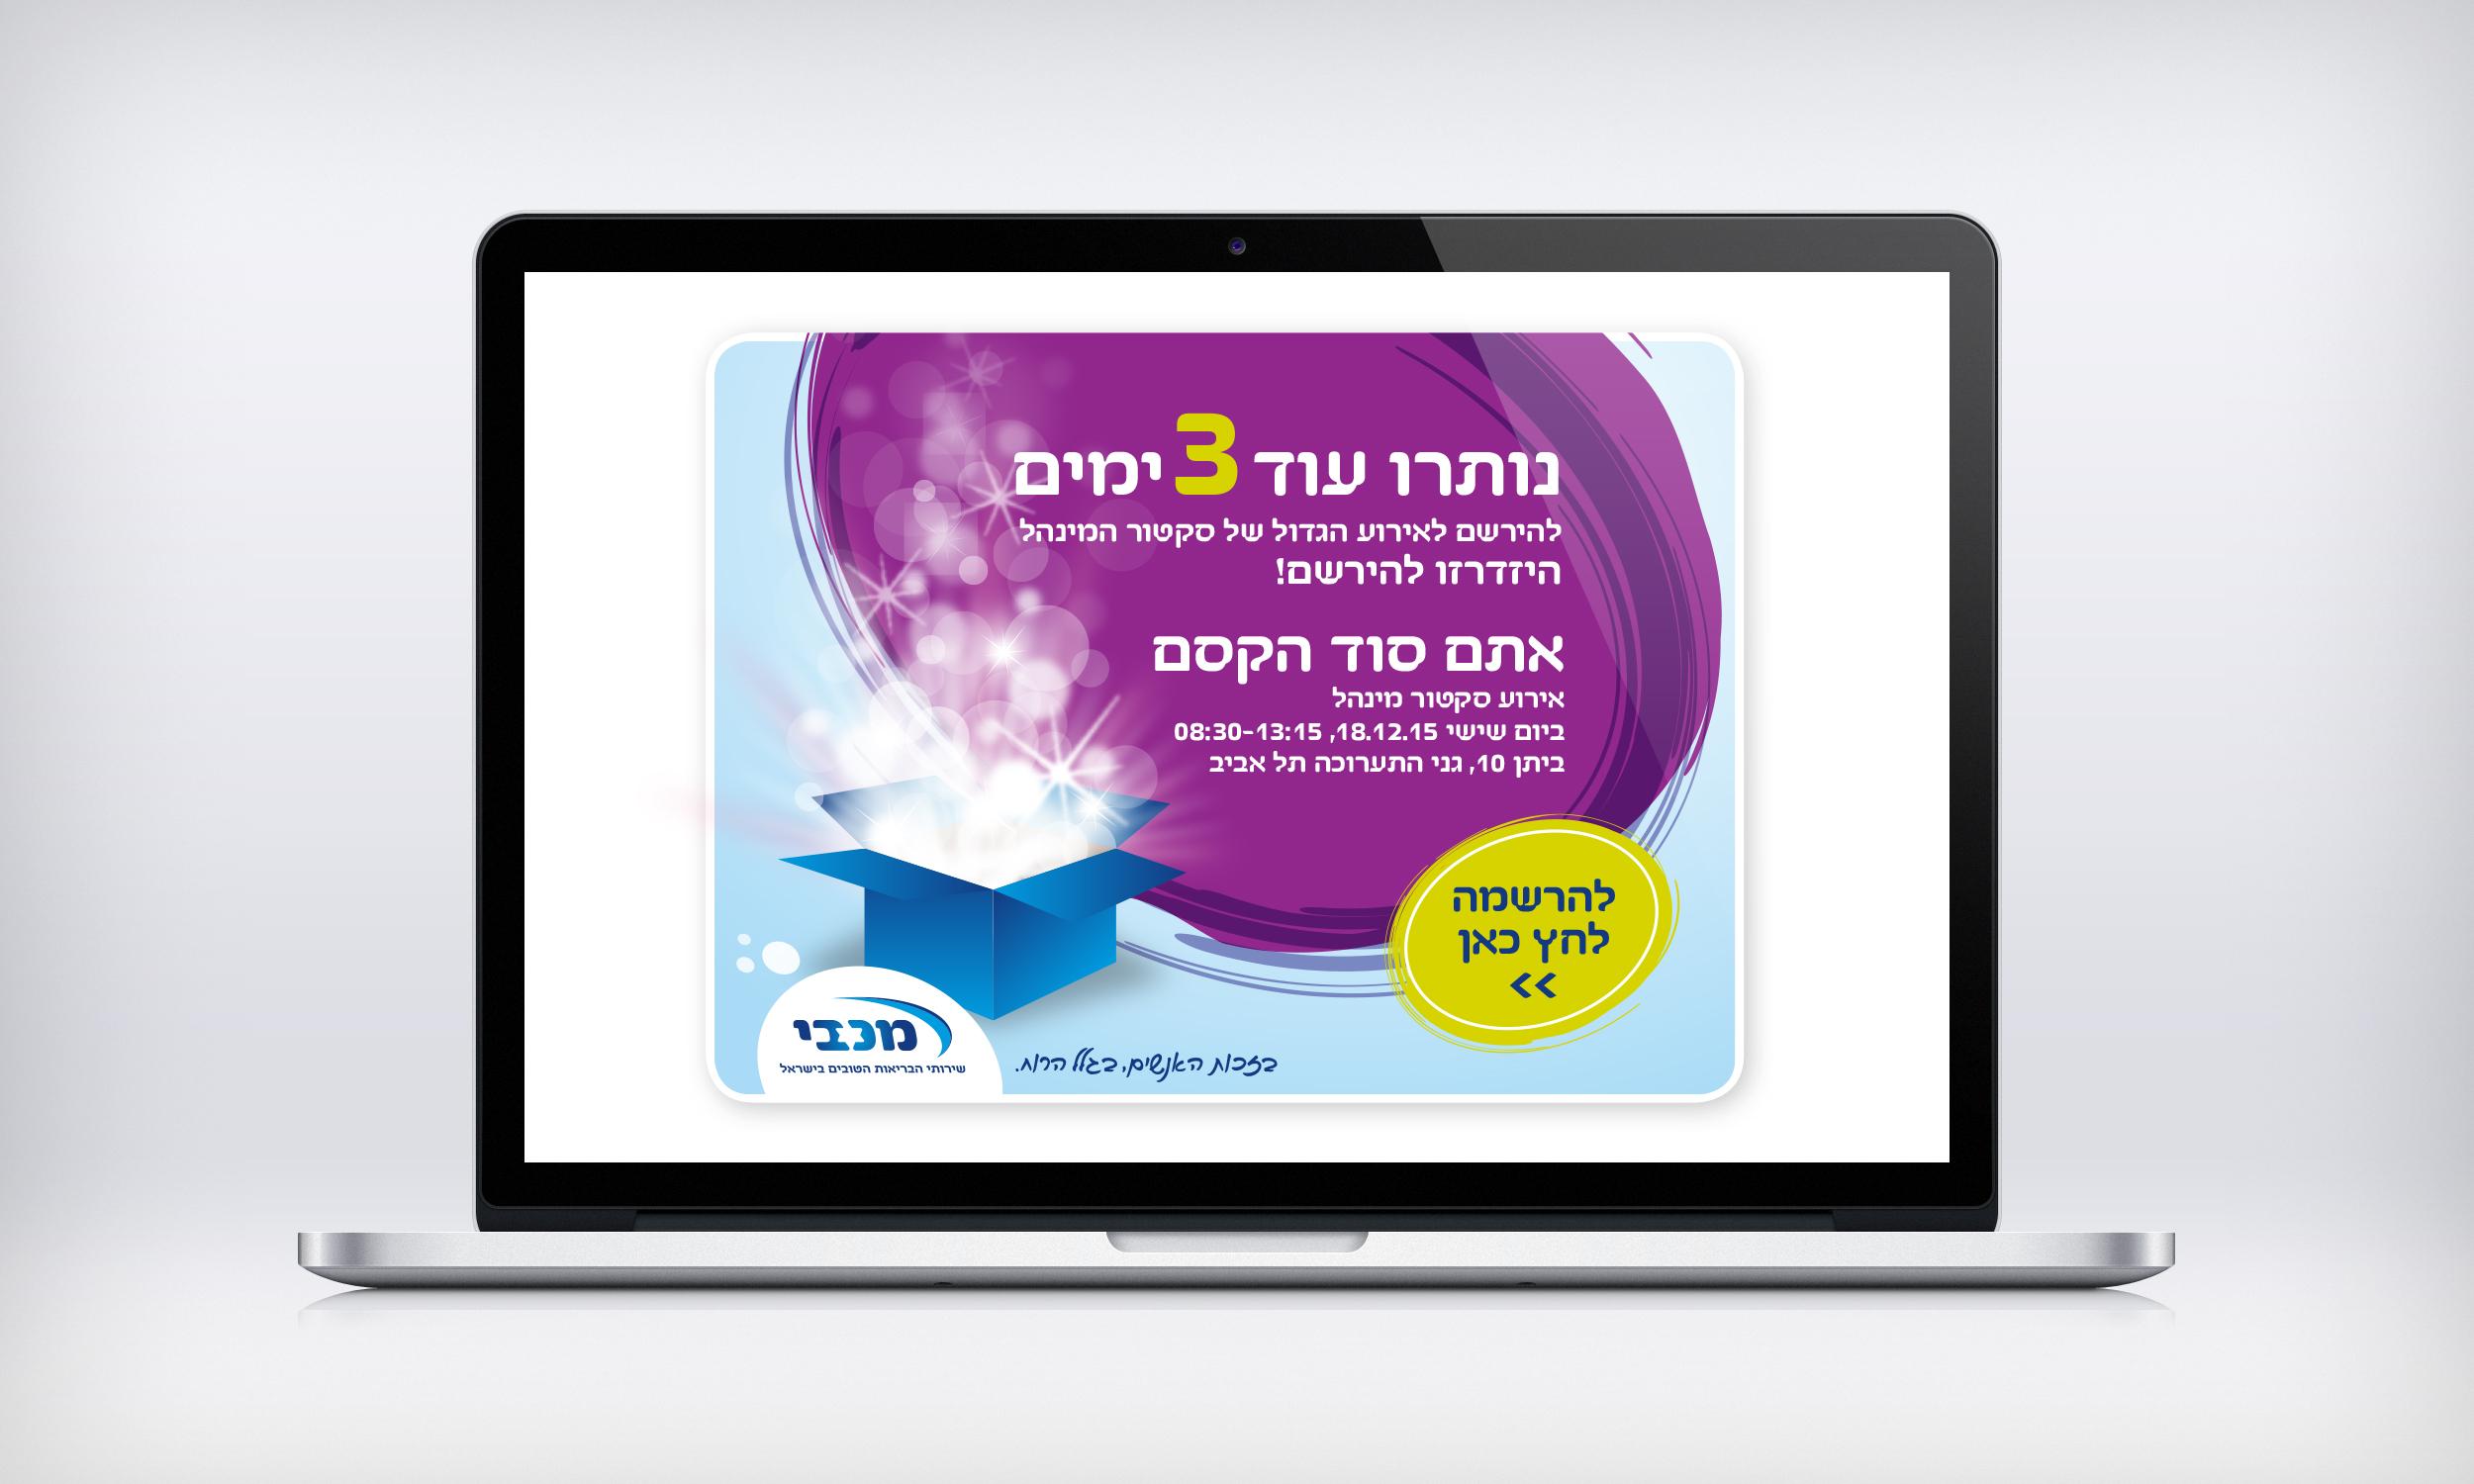 MaccabiMail